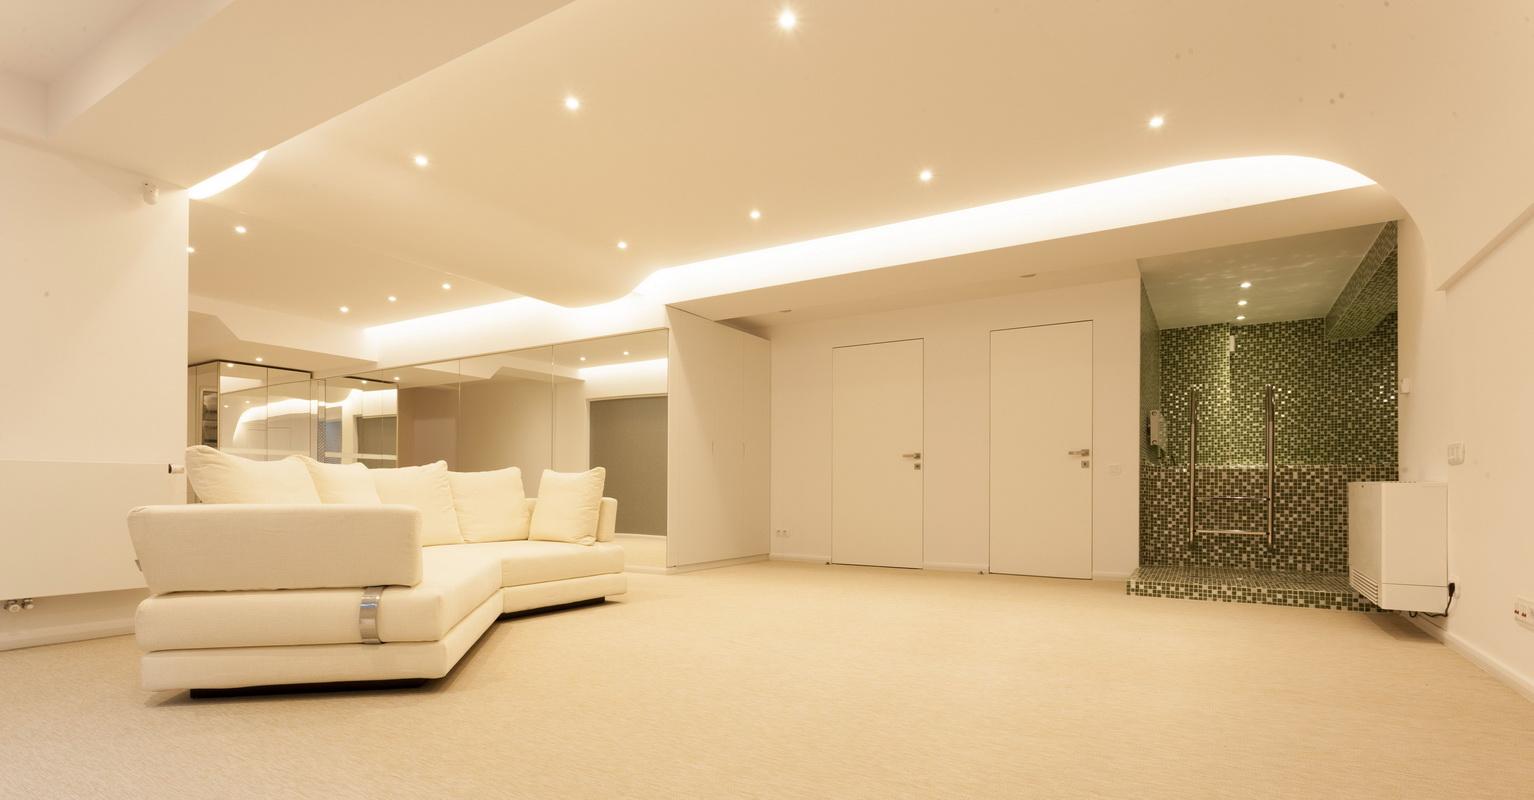 https://nbc-arhitect.ro/wp-content/uploads/2020/10/NBC-ARHITECT-_-housing-_-Sandu-Aldea-House-Villa-_-interior-view_3.jpg